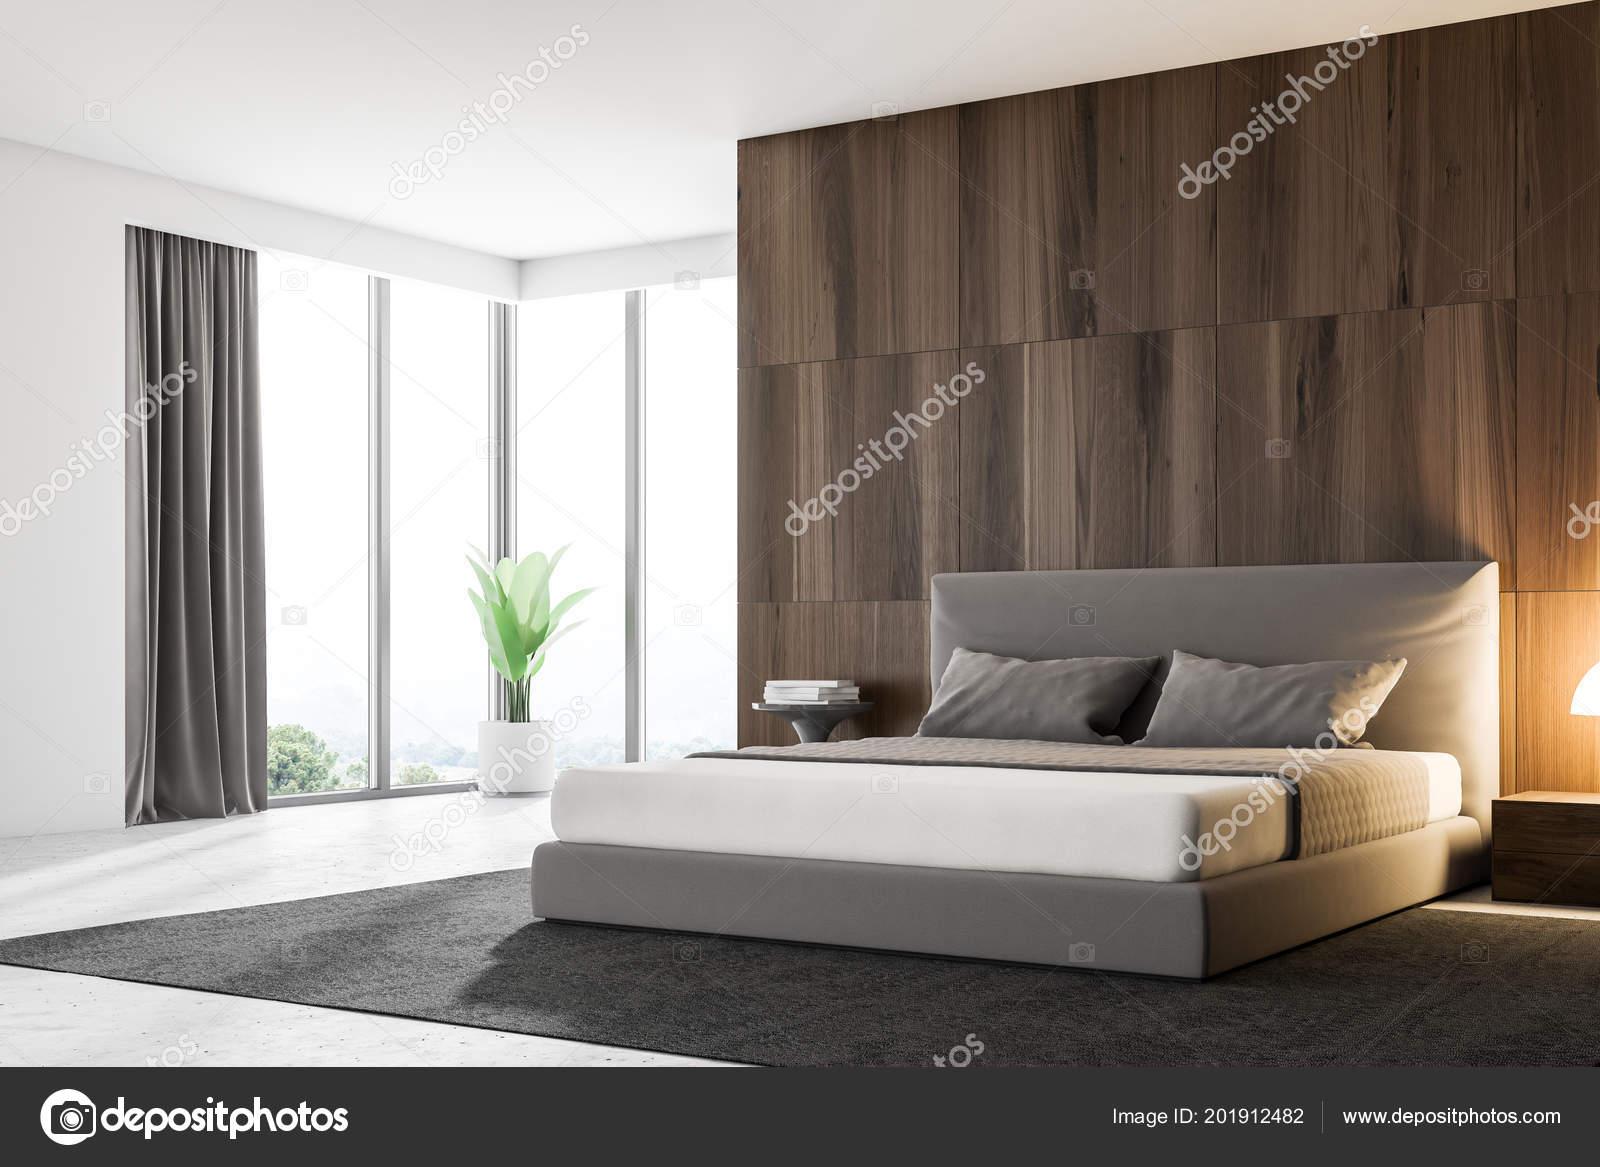 Esquina del dormitorio principal con paredes madera oscuras cama principal foto de stock - Foto chambre a coucher ...